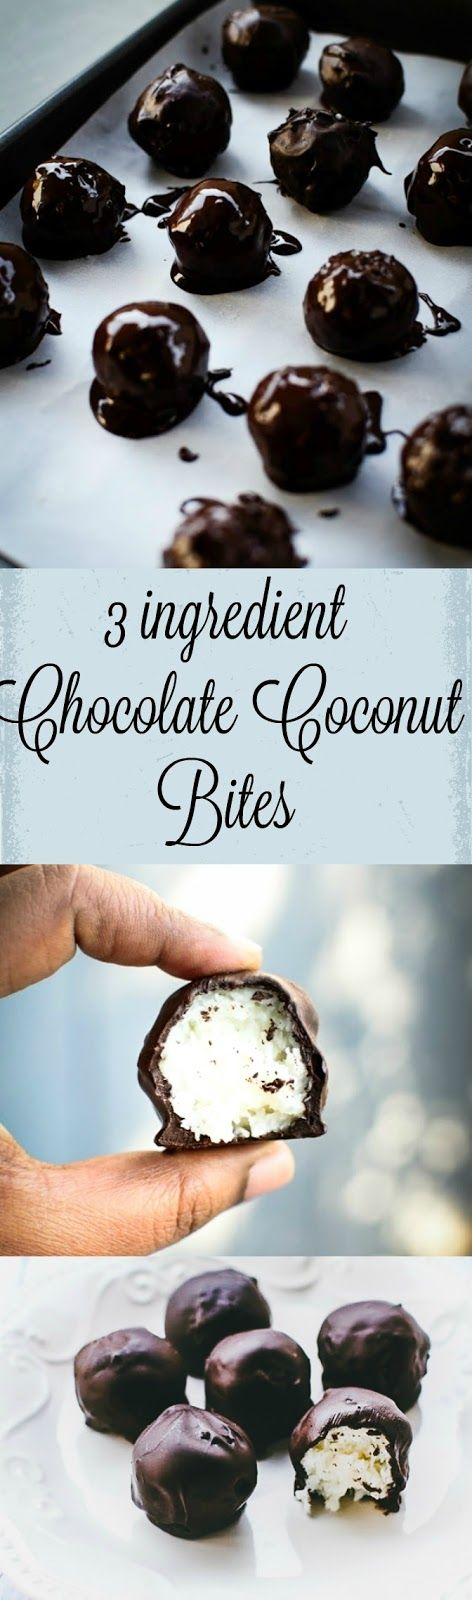 Chocolate Coconut Balls Recipe | Forks N Knives | Bloglovin'